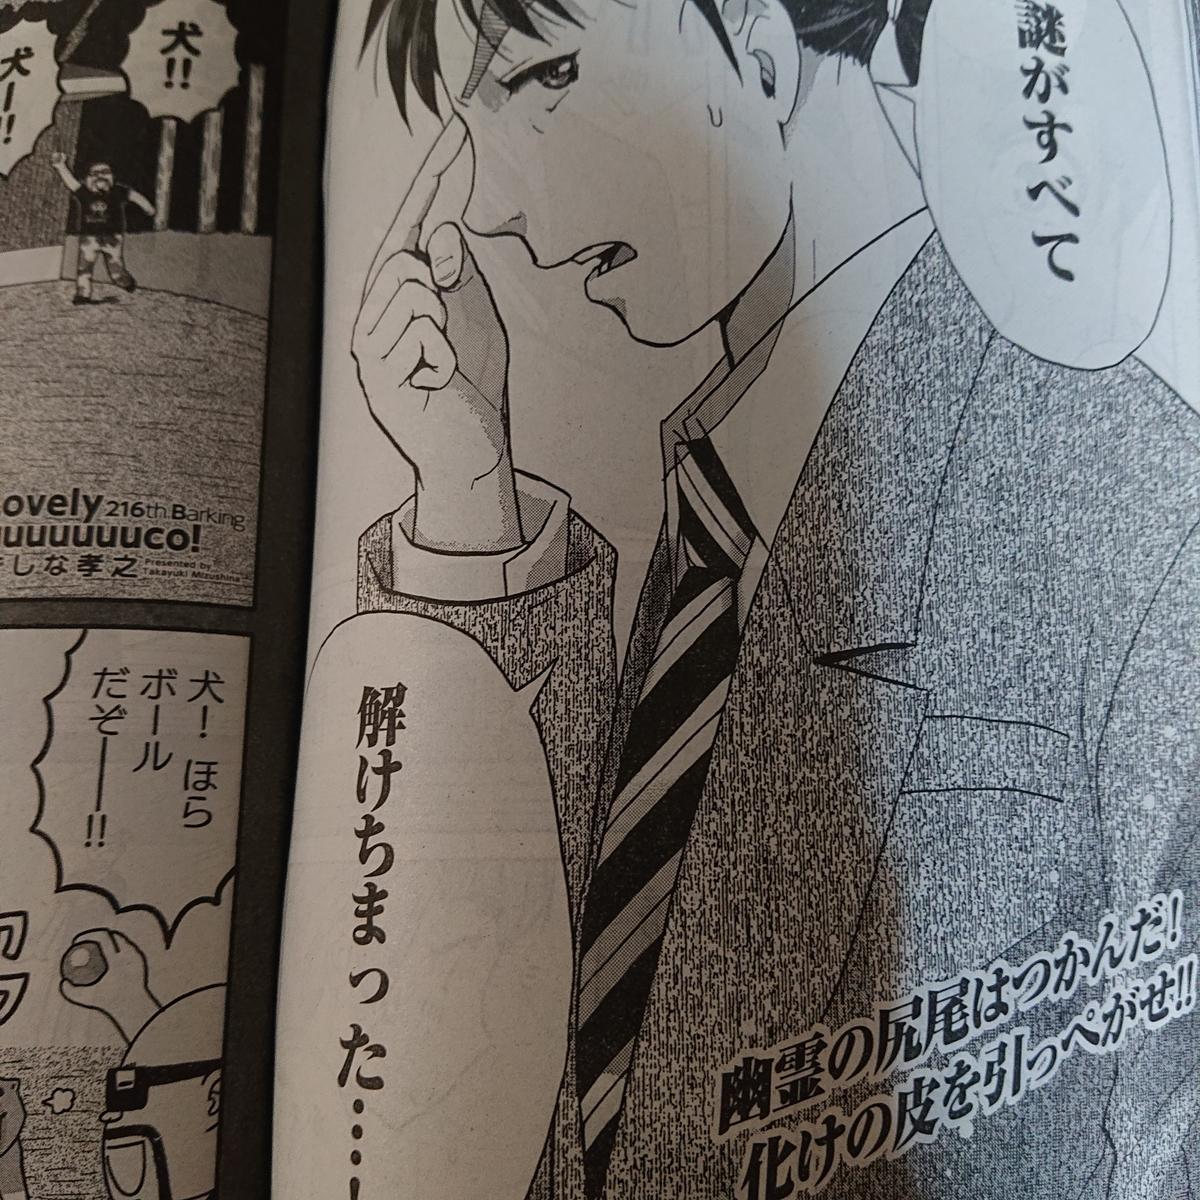 f:id:shikokumimami1:20200731175029j:plain